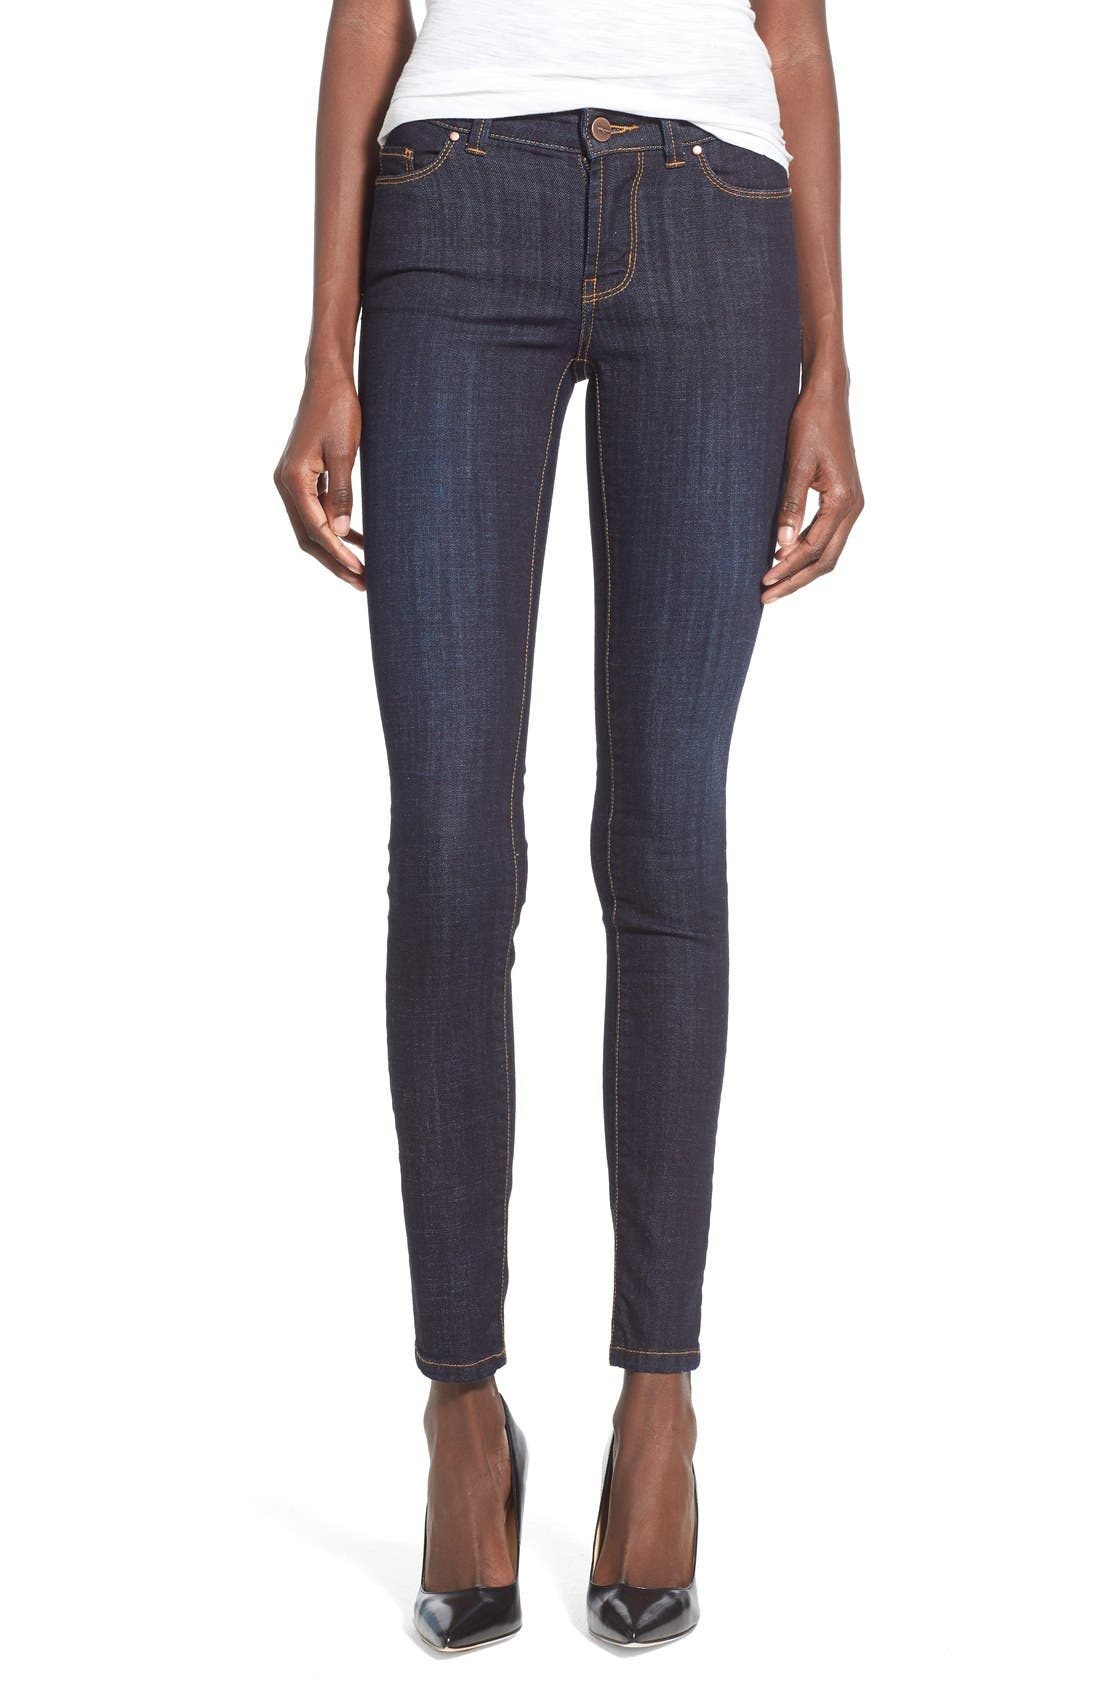 Main Image - Halogen® Plain Pocket Stretch Skinny Jeans (Regular & Petite)